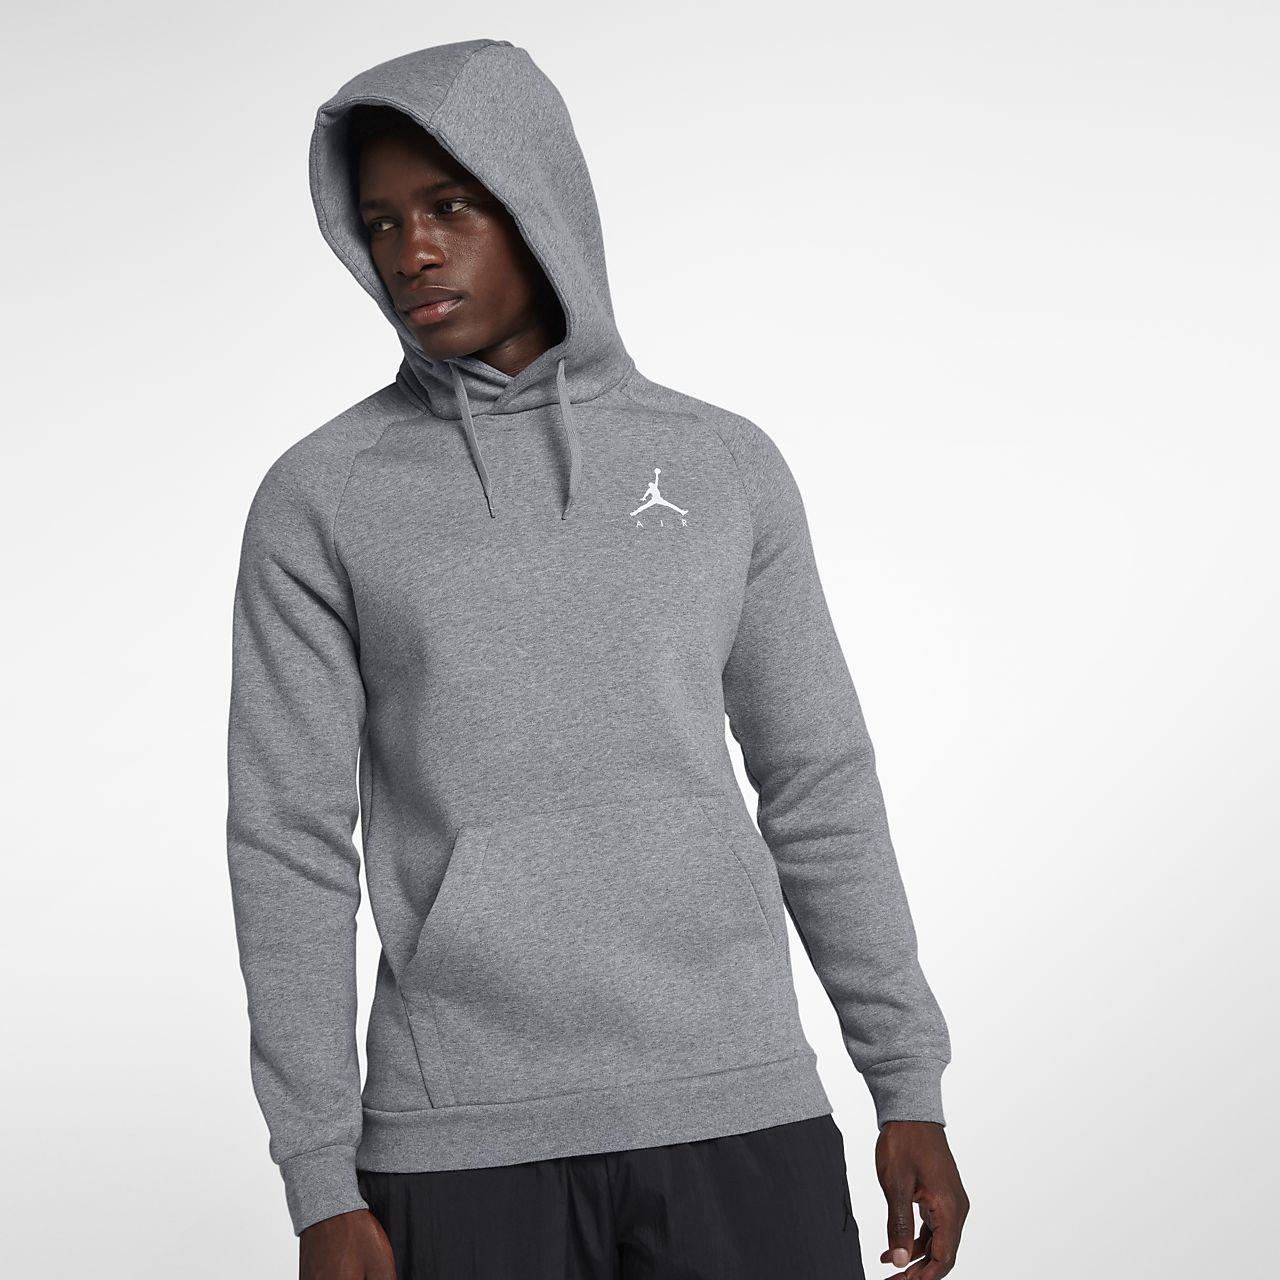 495ecc1087c8df Jordan Jumpman Men s Fleece Pullover Hoodie. Nike.com